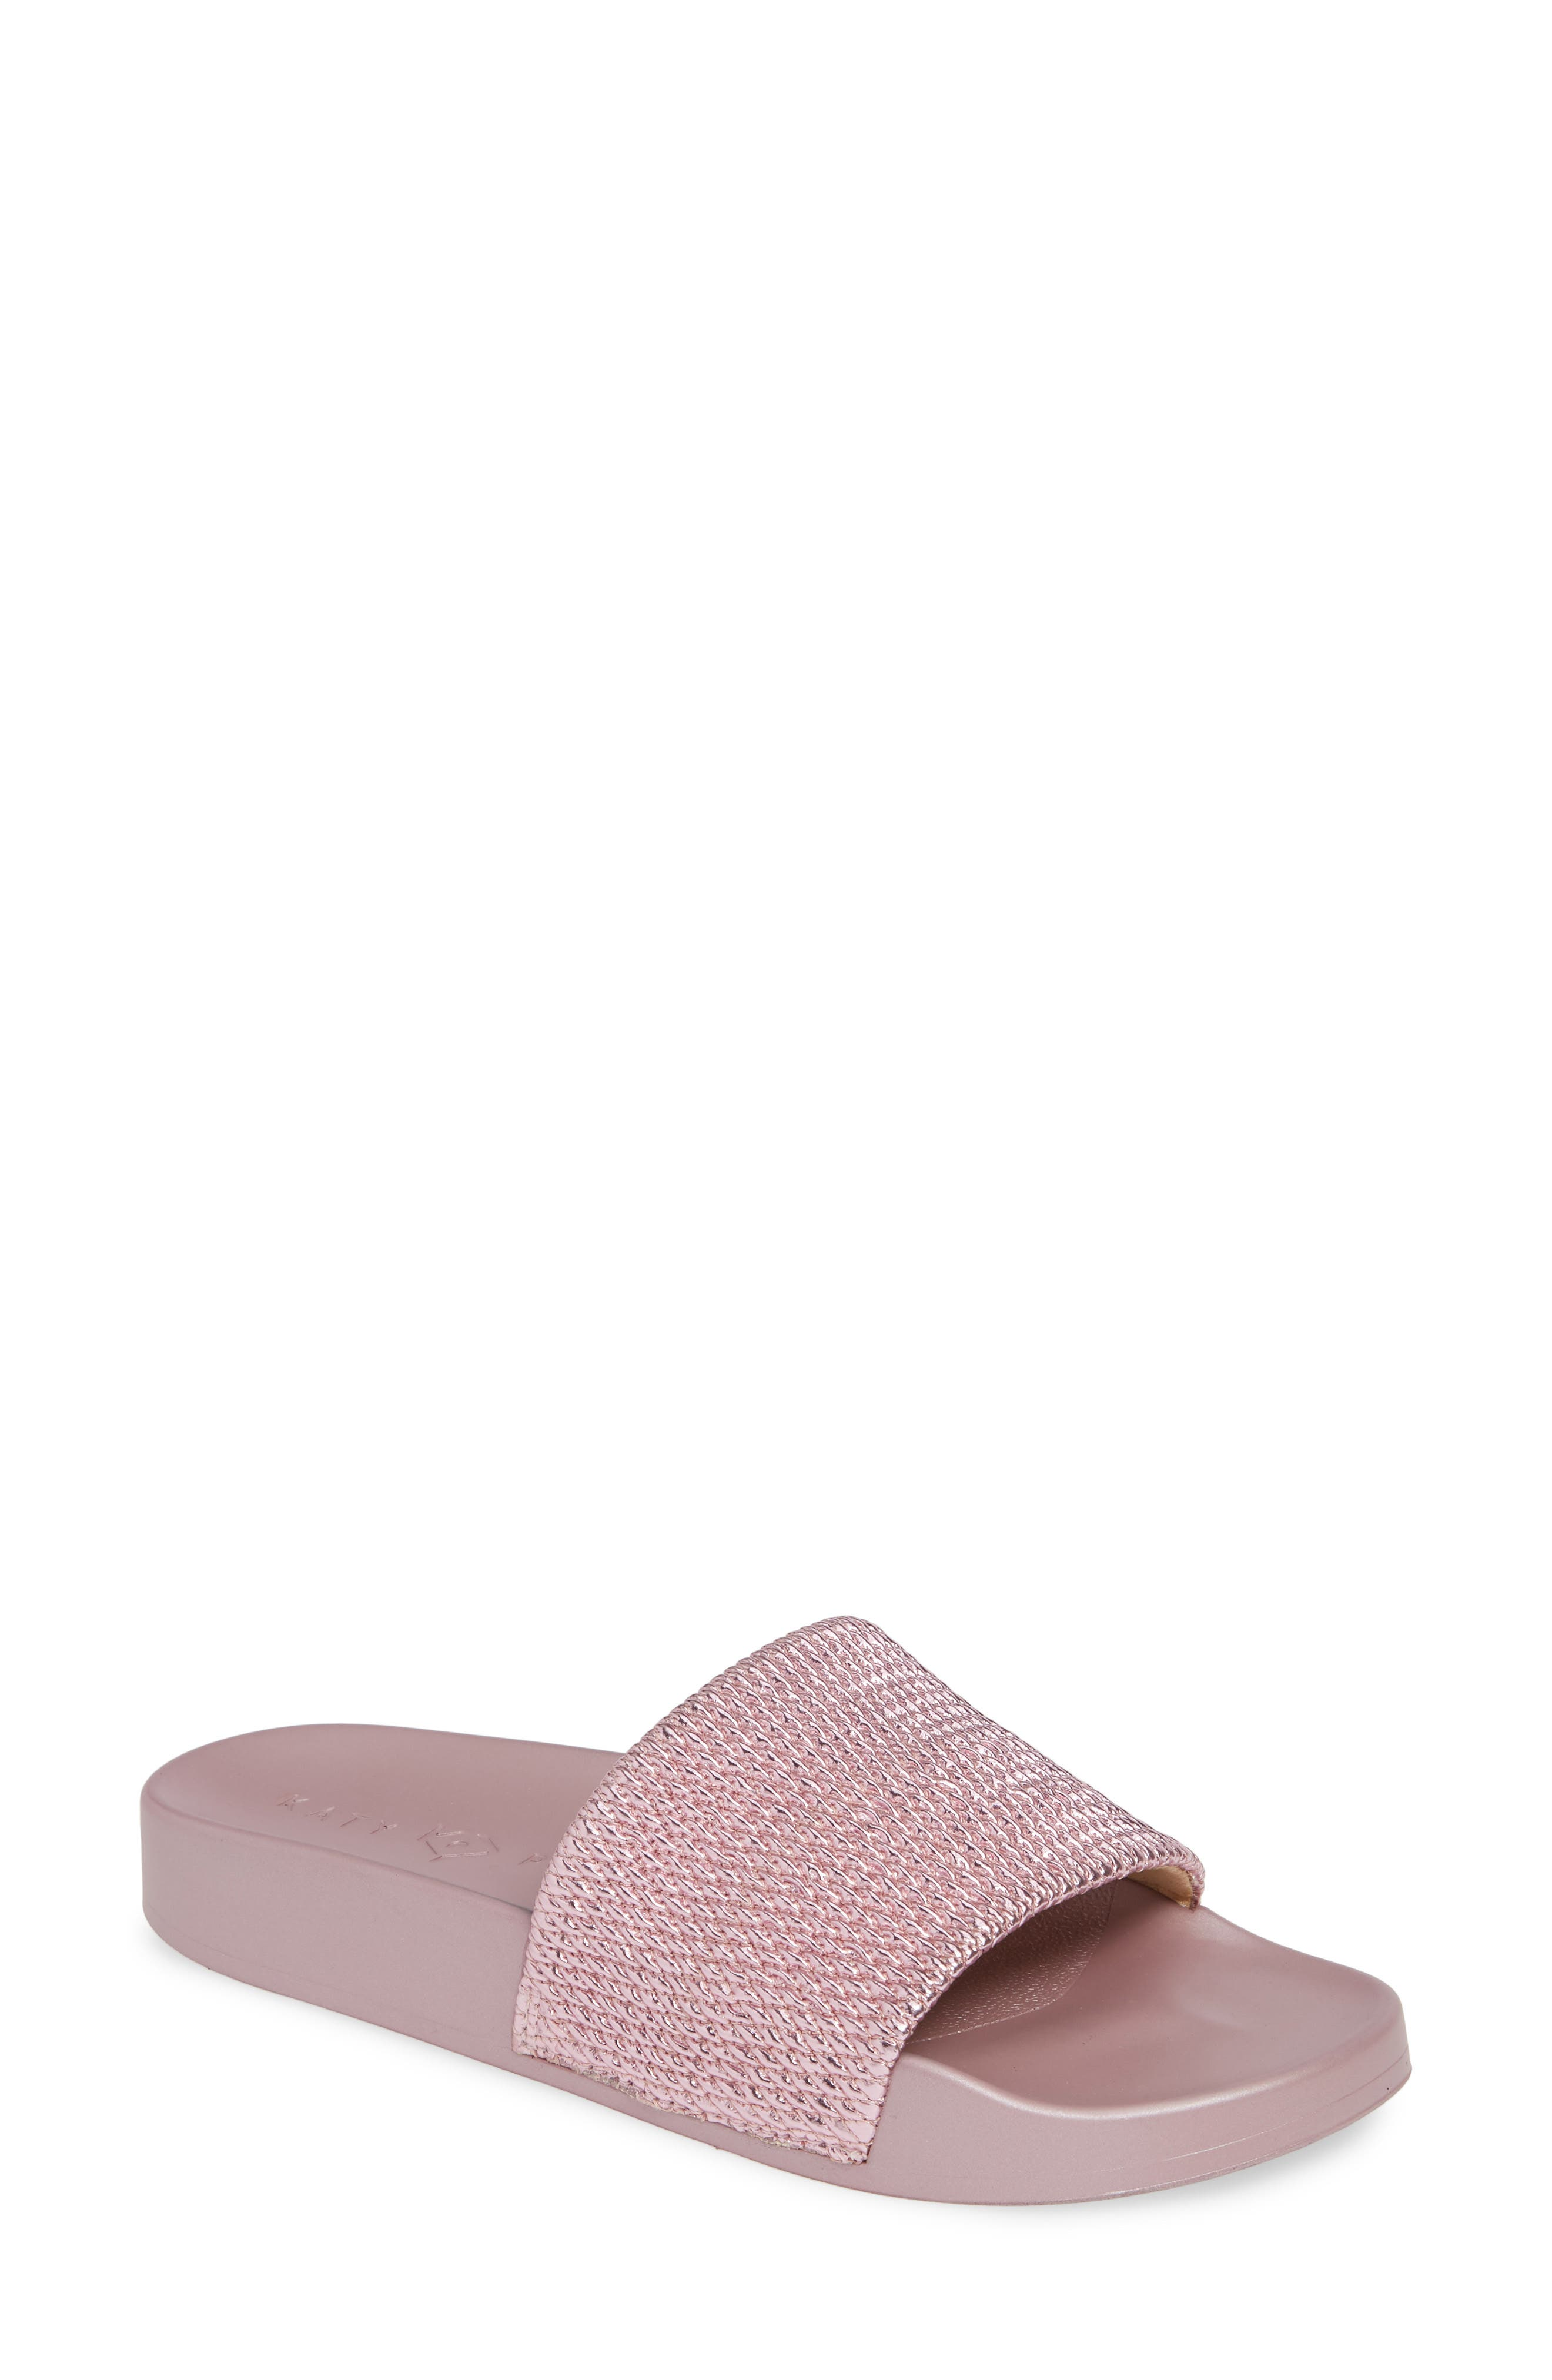 women's katy perry the jimmi slide sandal, size 11 m - purple